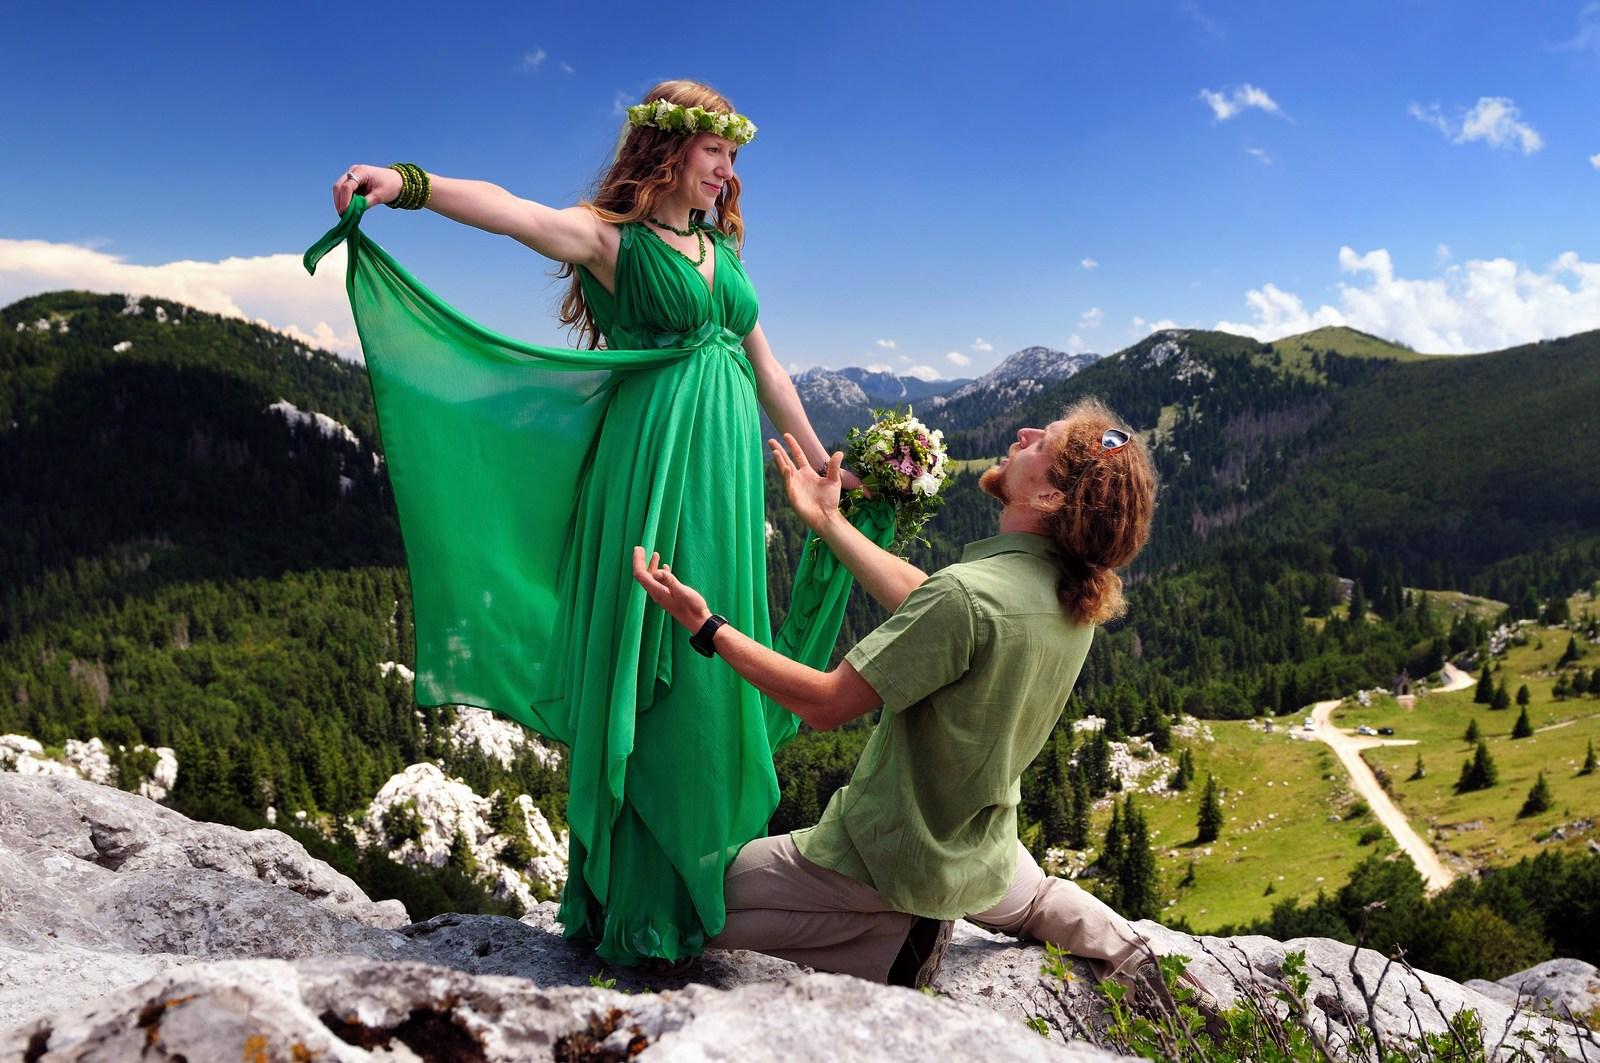 Ljubezen, čista ljubezen je tale prekrasen Velebit. Foto: HTZ in Aleksandar Gospić.